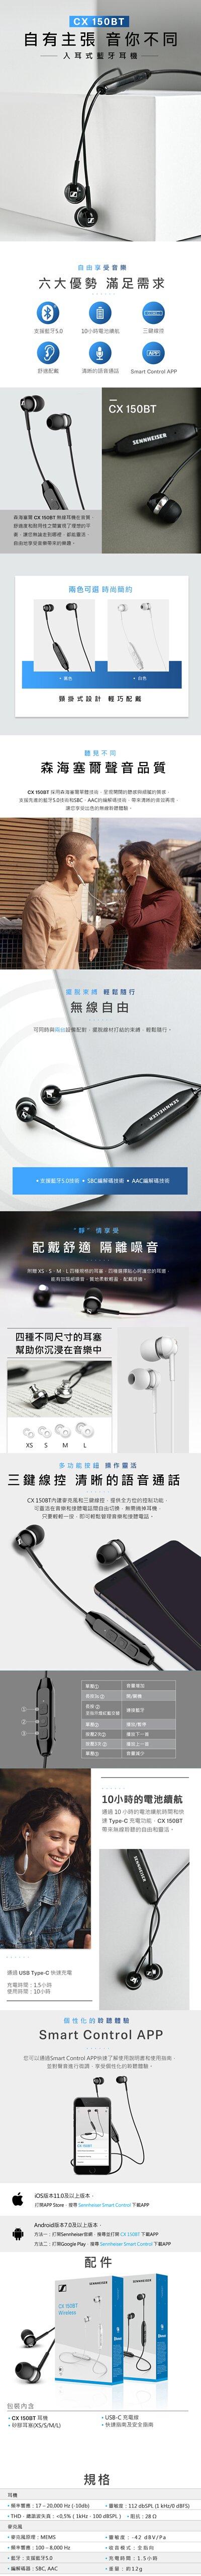 Sennheiser,森海塞爾,cx150bt, 無線藍牙,降噪耳機,第三代,音樂耳機,無線耳機,降噪耳機